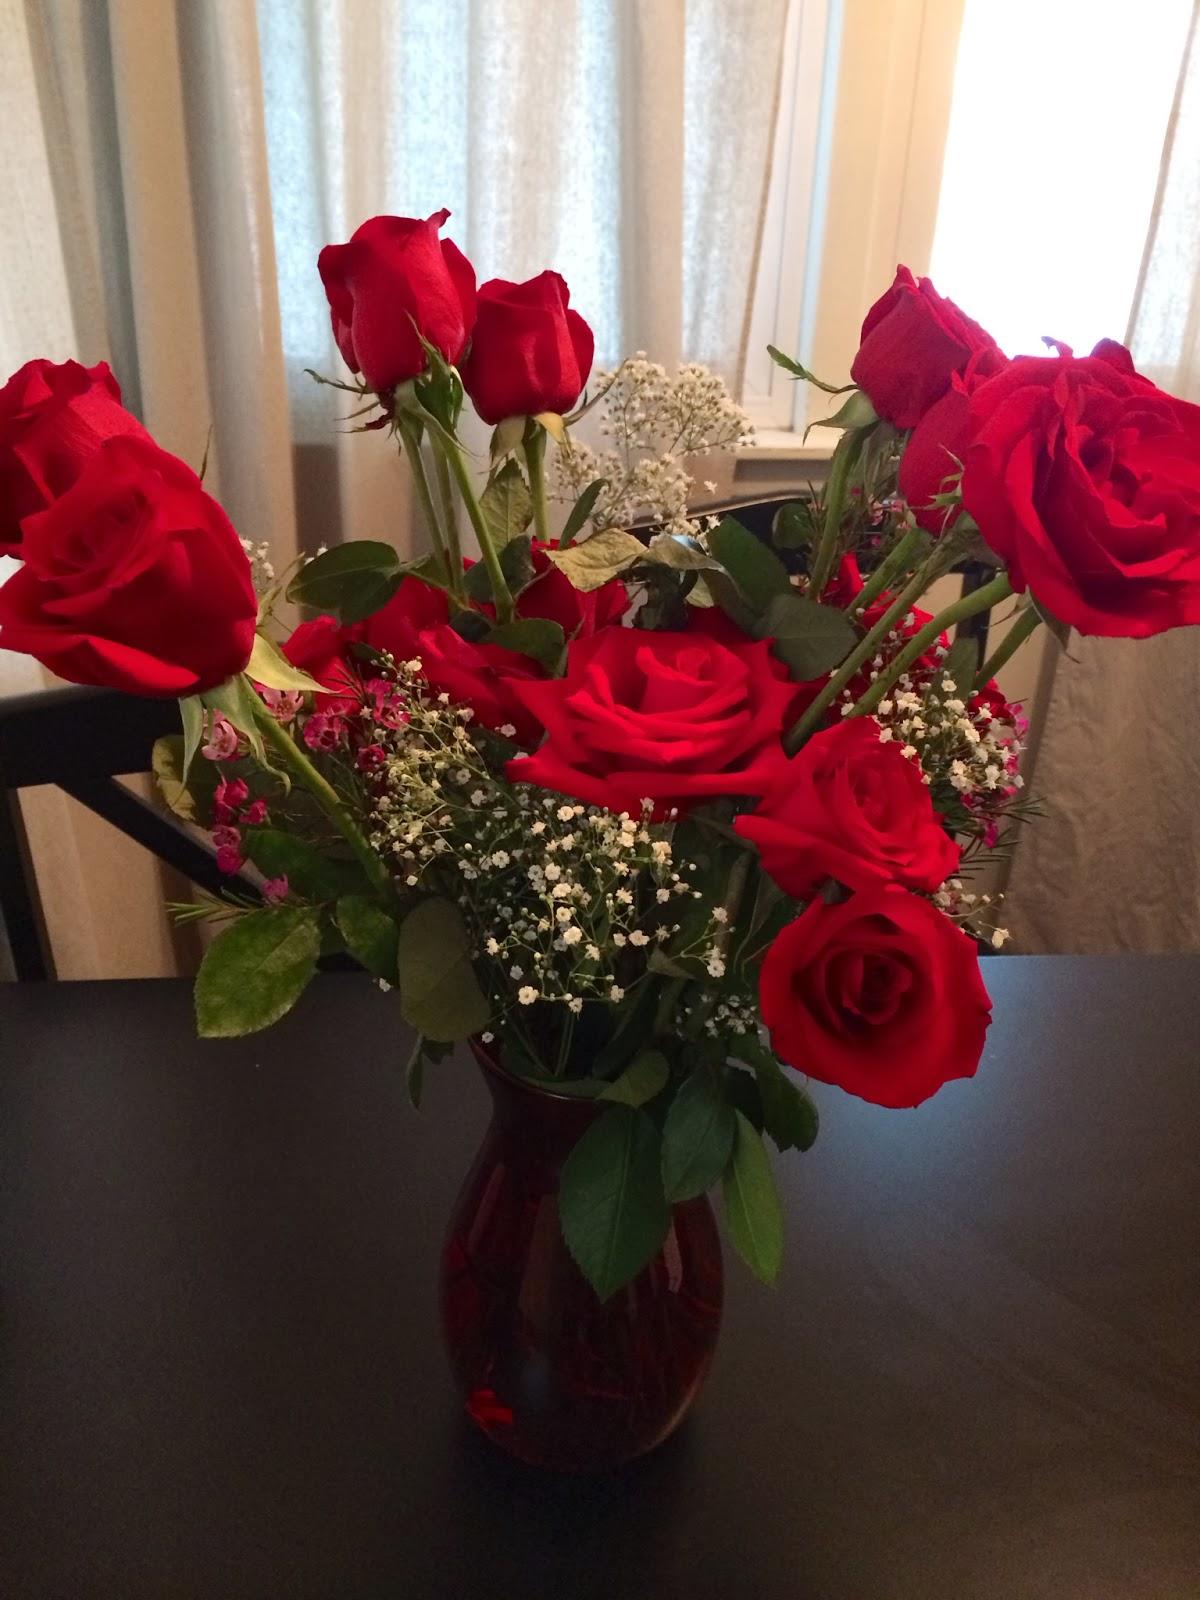 Awe and Blah Costco Flowers vs ProFlowers